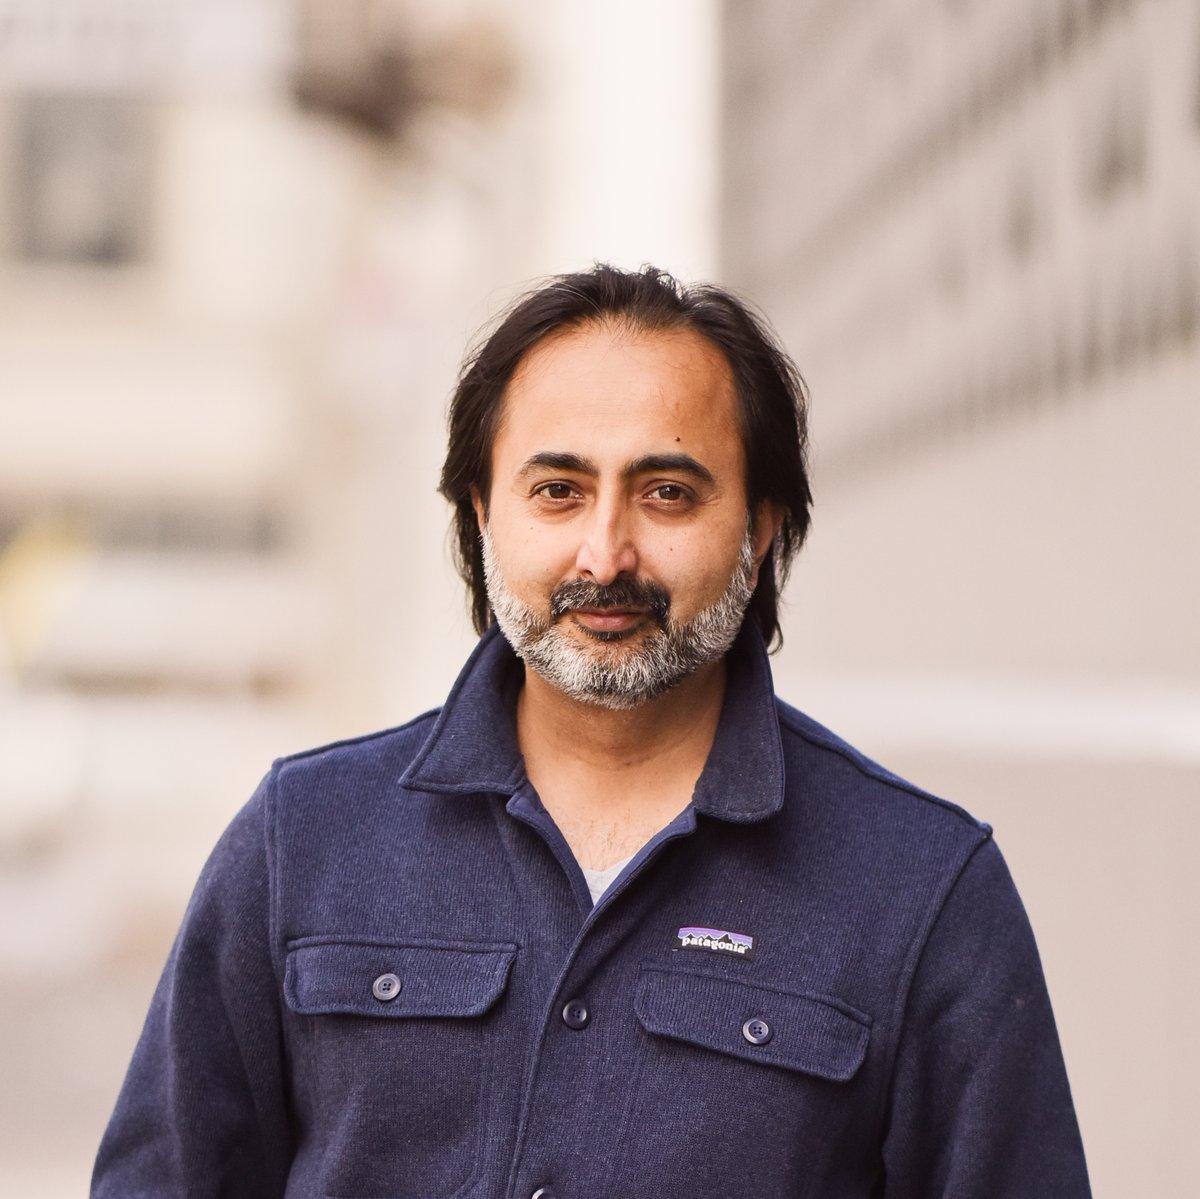 Profile photo of Hemant Taneja, Director at Samsara